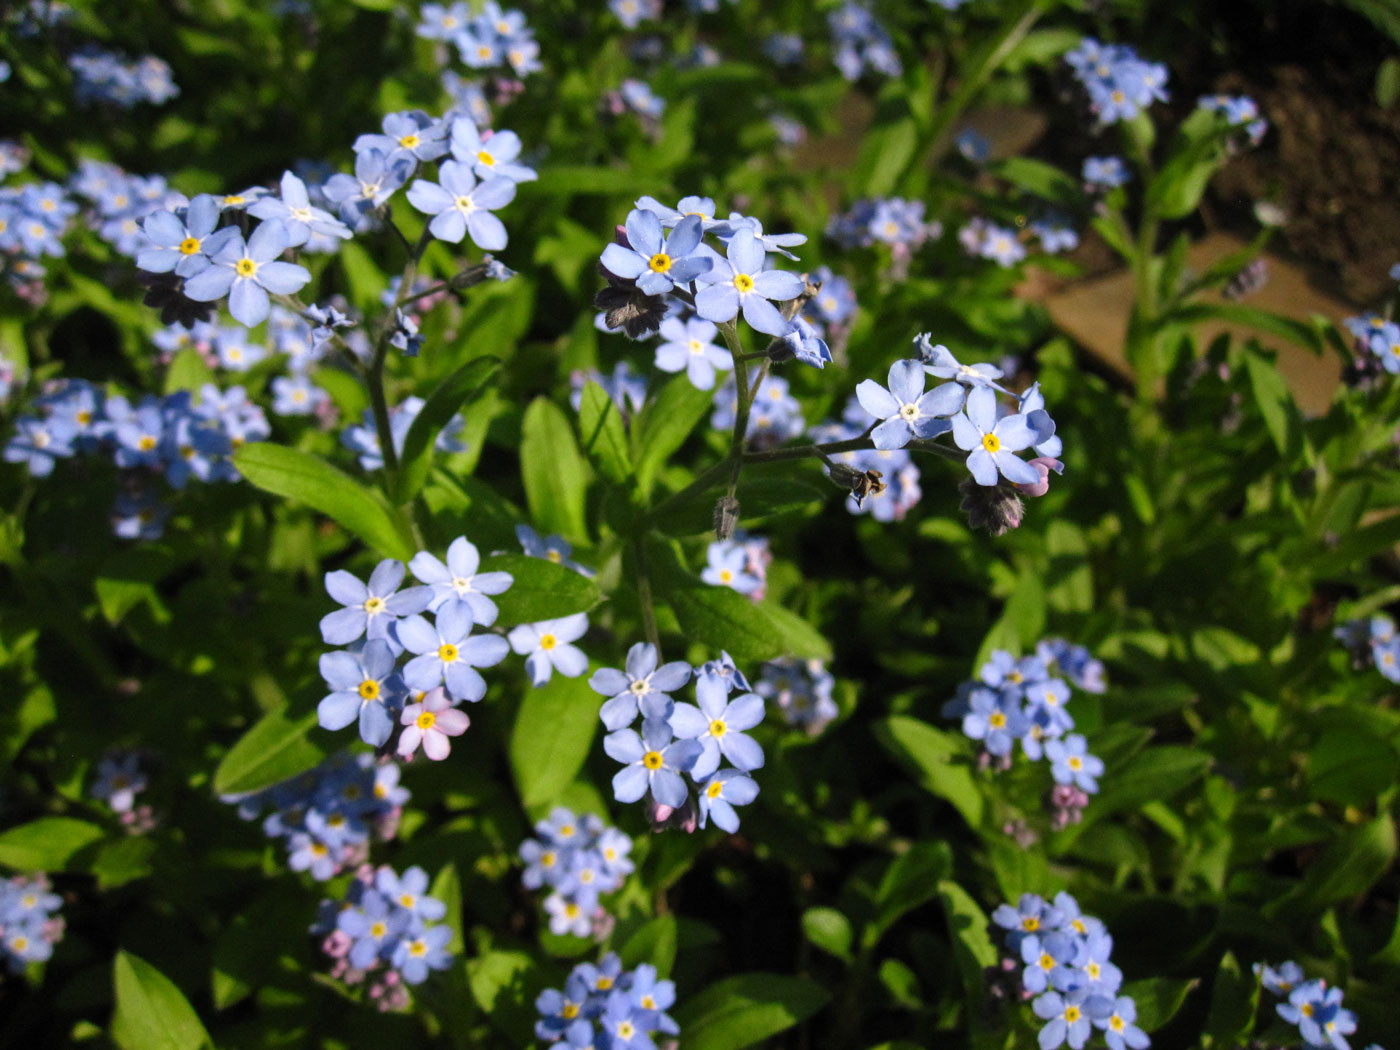 Wald-Vergissmeinnicht (Myosotis sylvatica) | RAUHBLATTGEWÄCHSE (Boraginaceae)